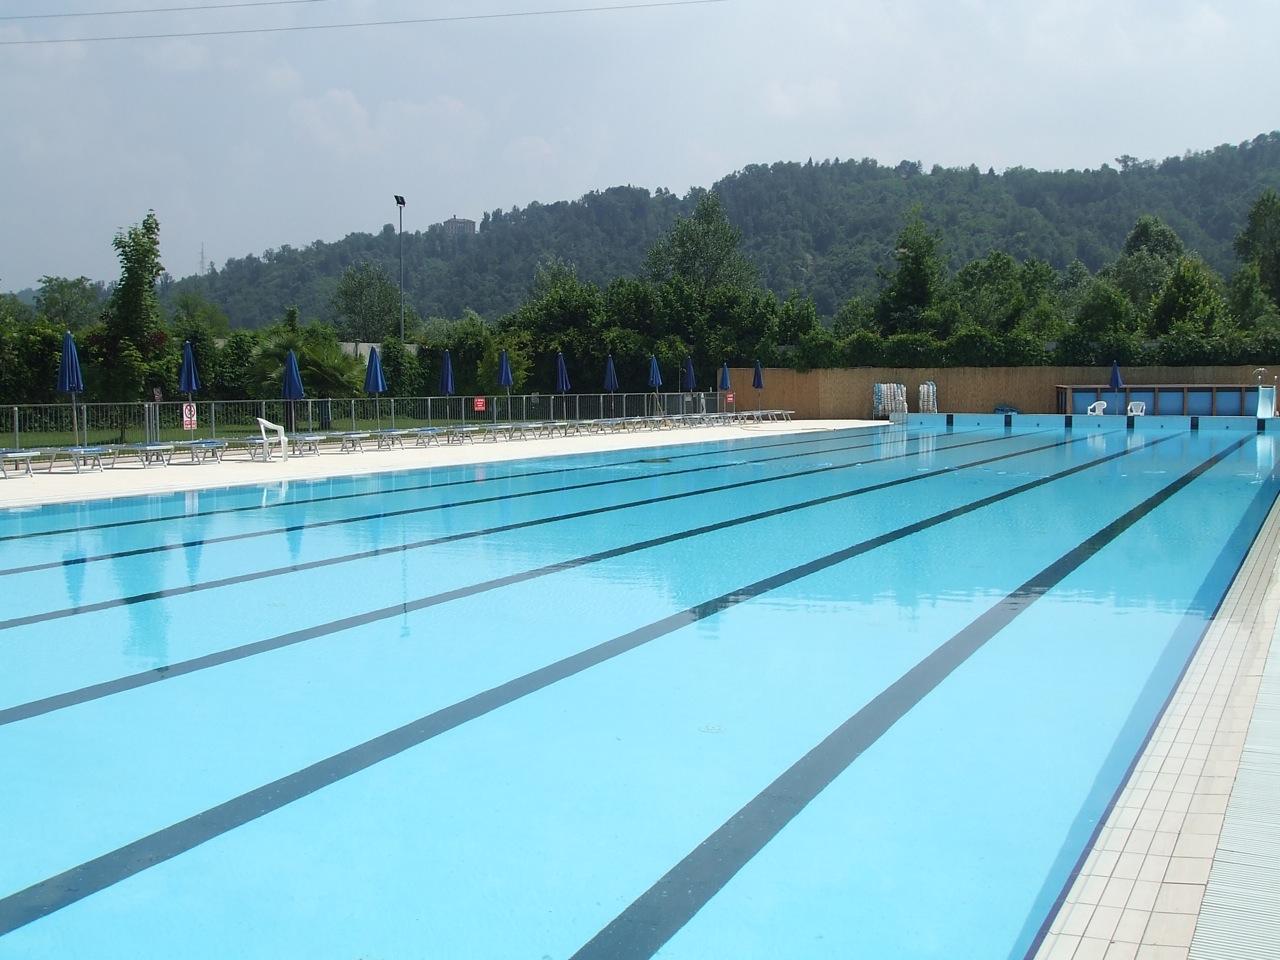 Piscine All Aperto Piemonte piscine e parchi acquatici in piemonte - piemonte expo